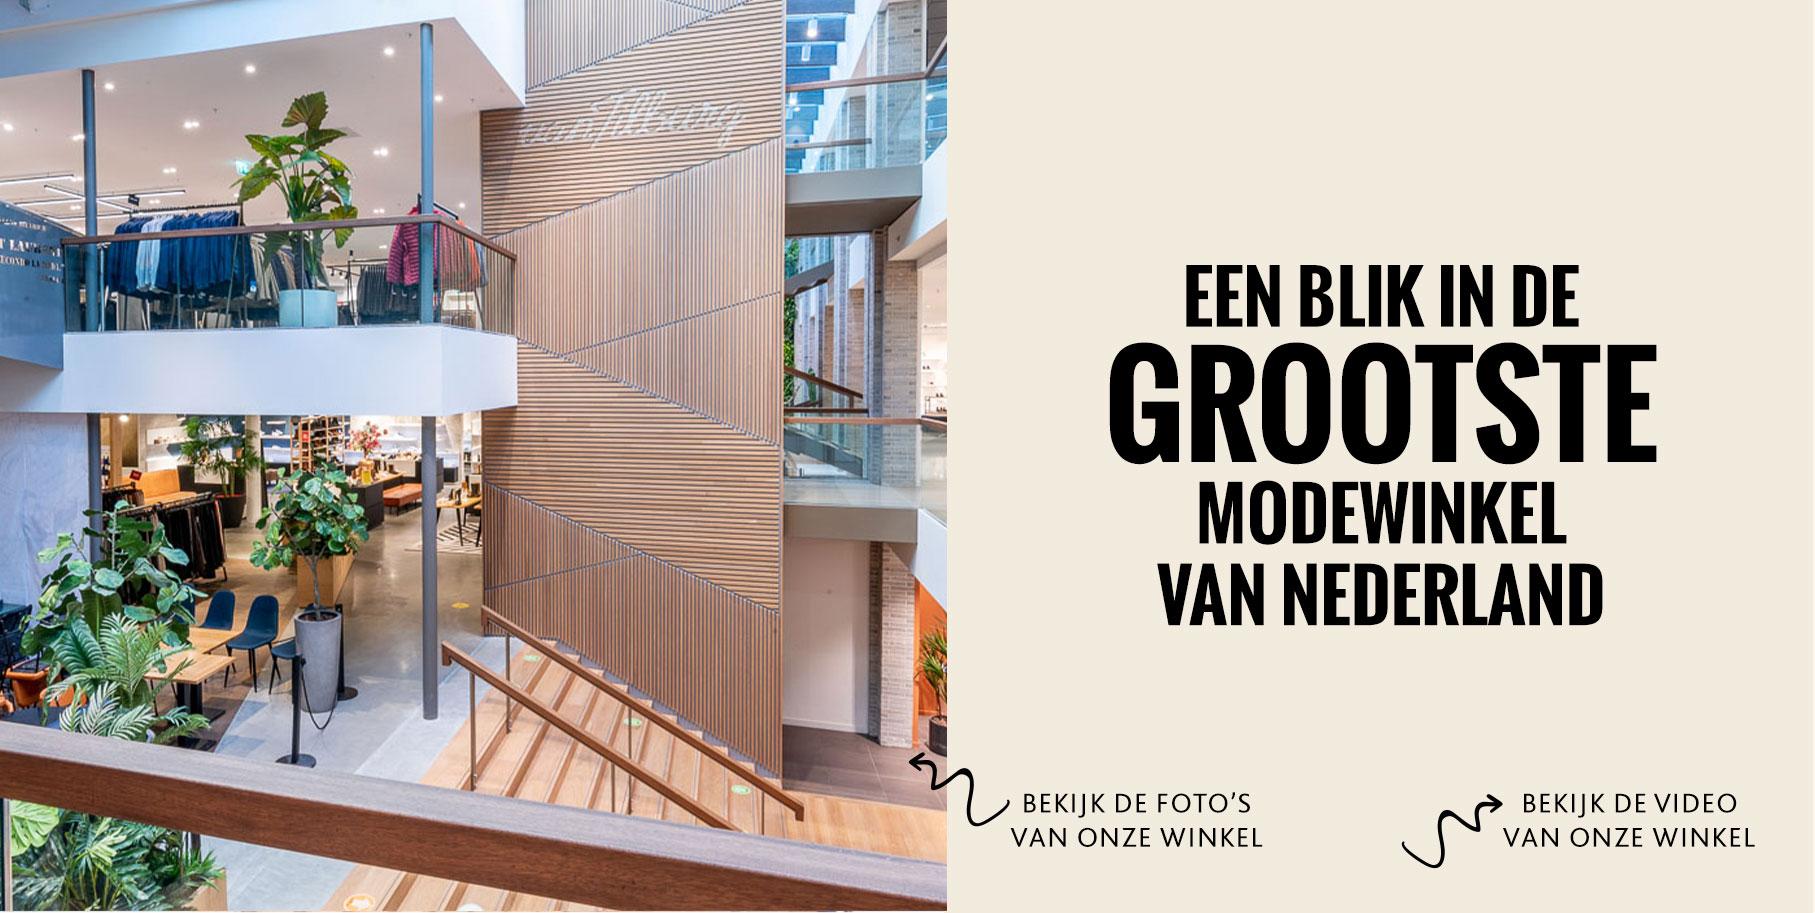 Grootste modewinkel van Nederland